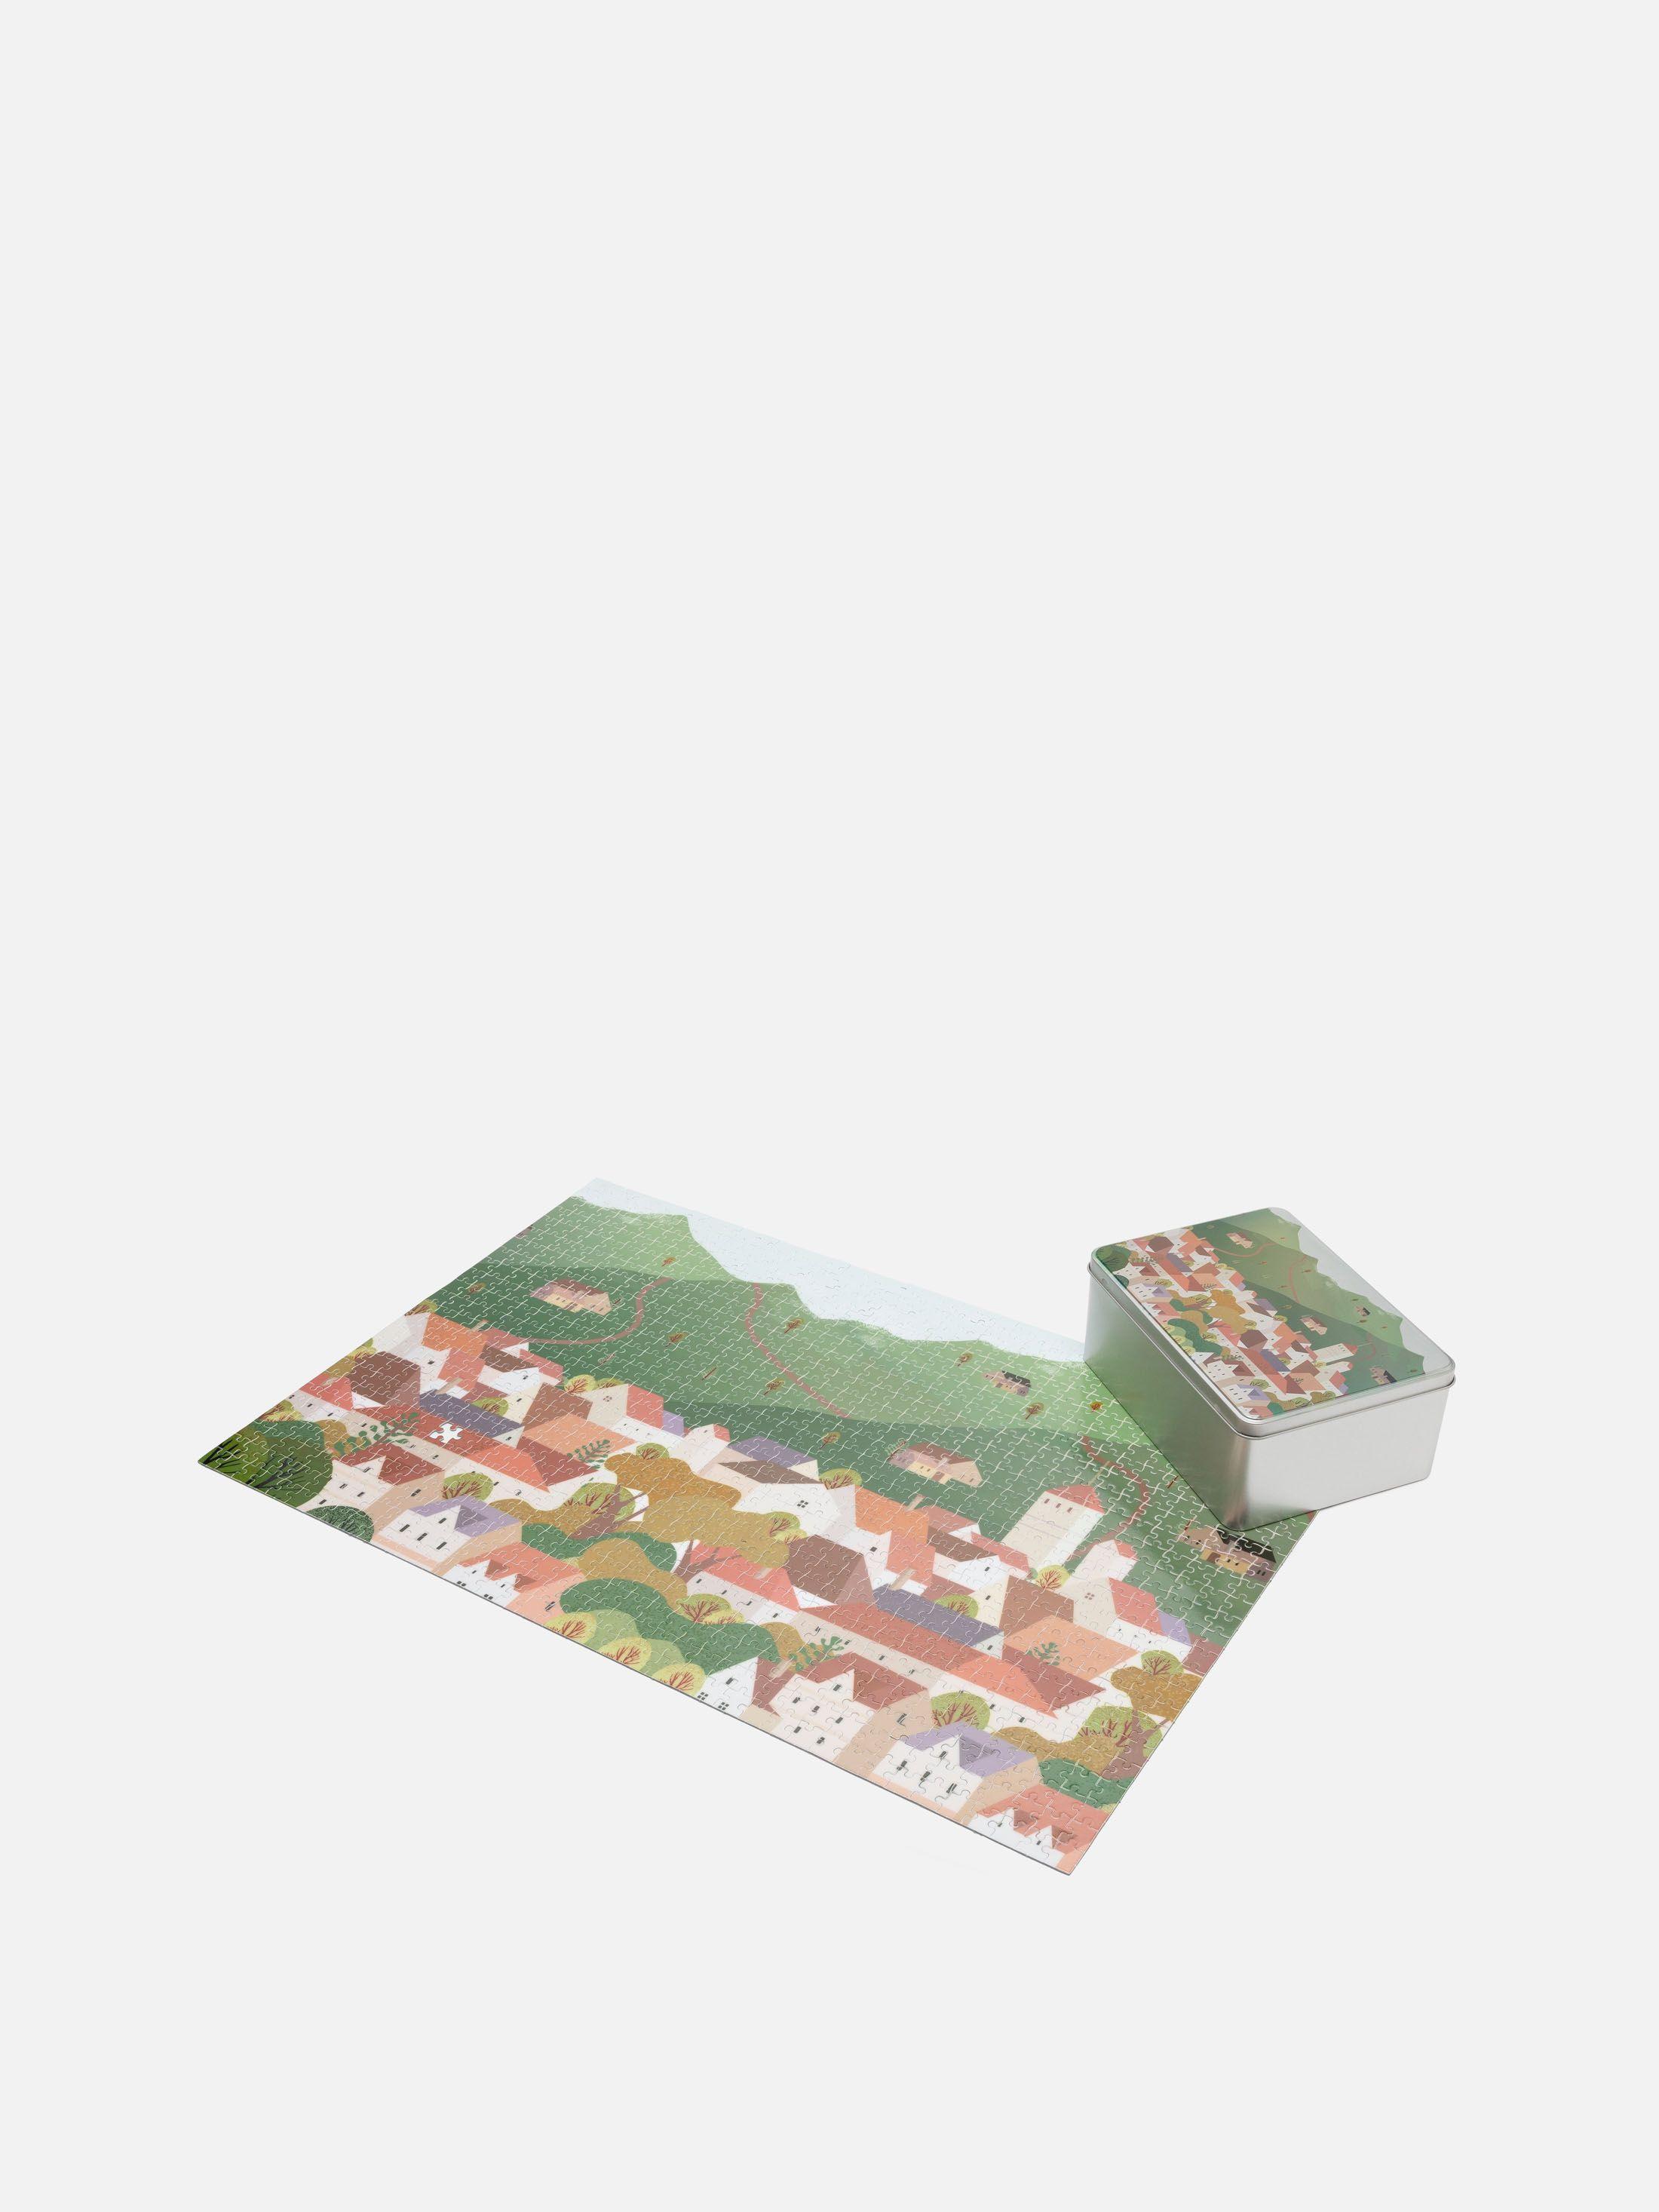 custom jigsaw puzzles